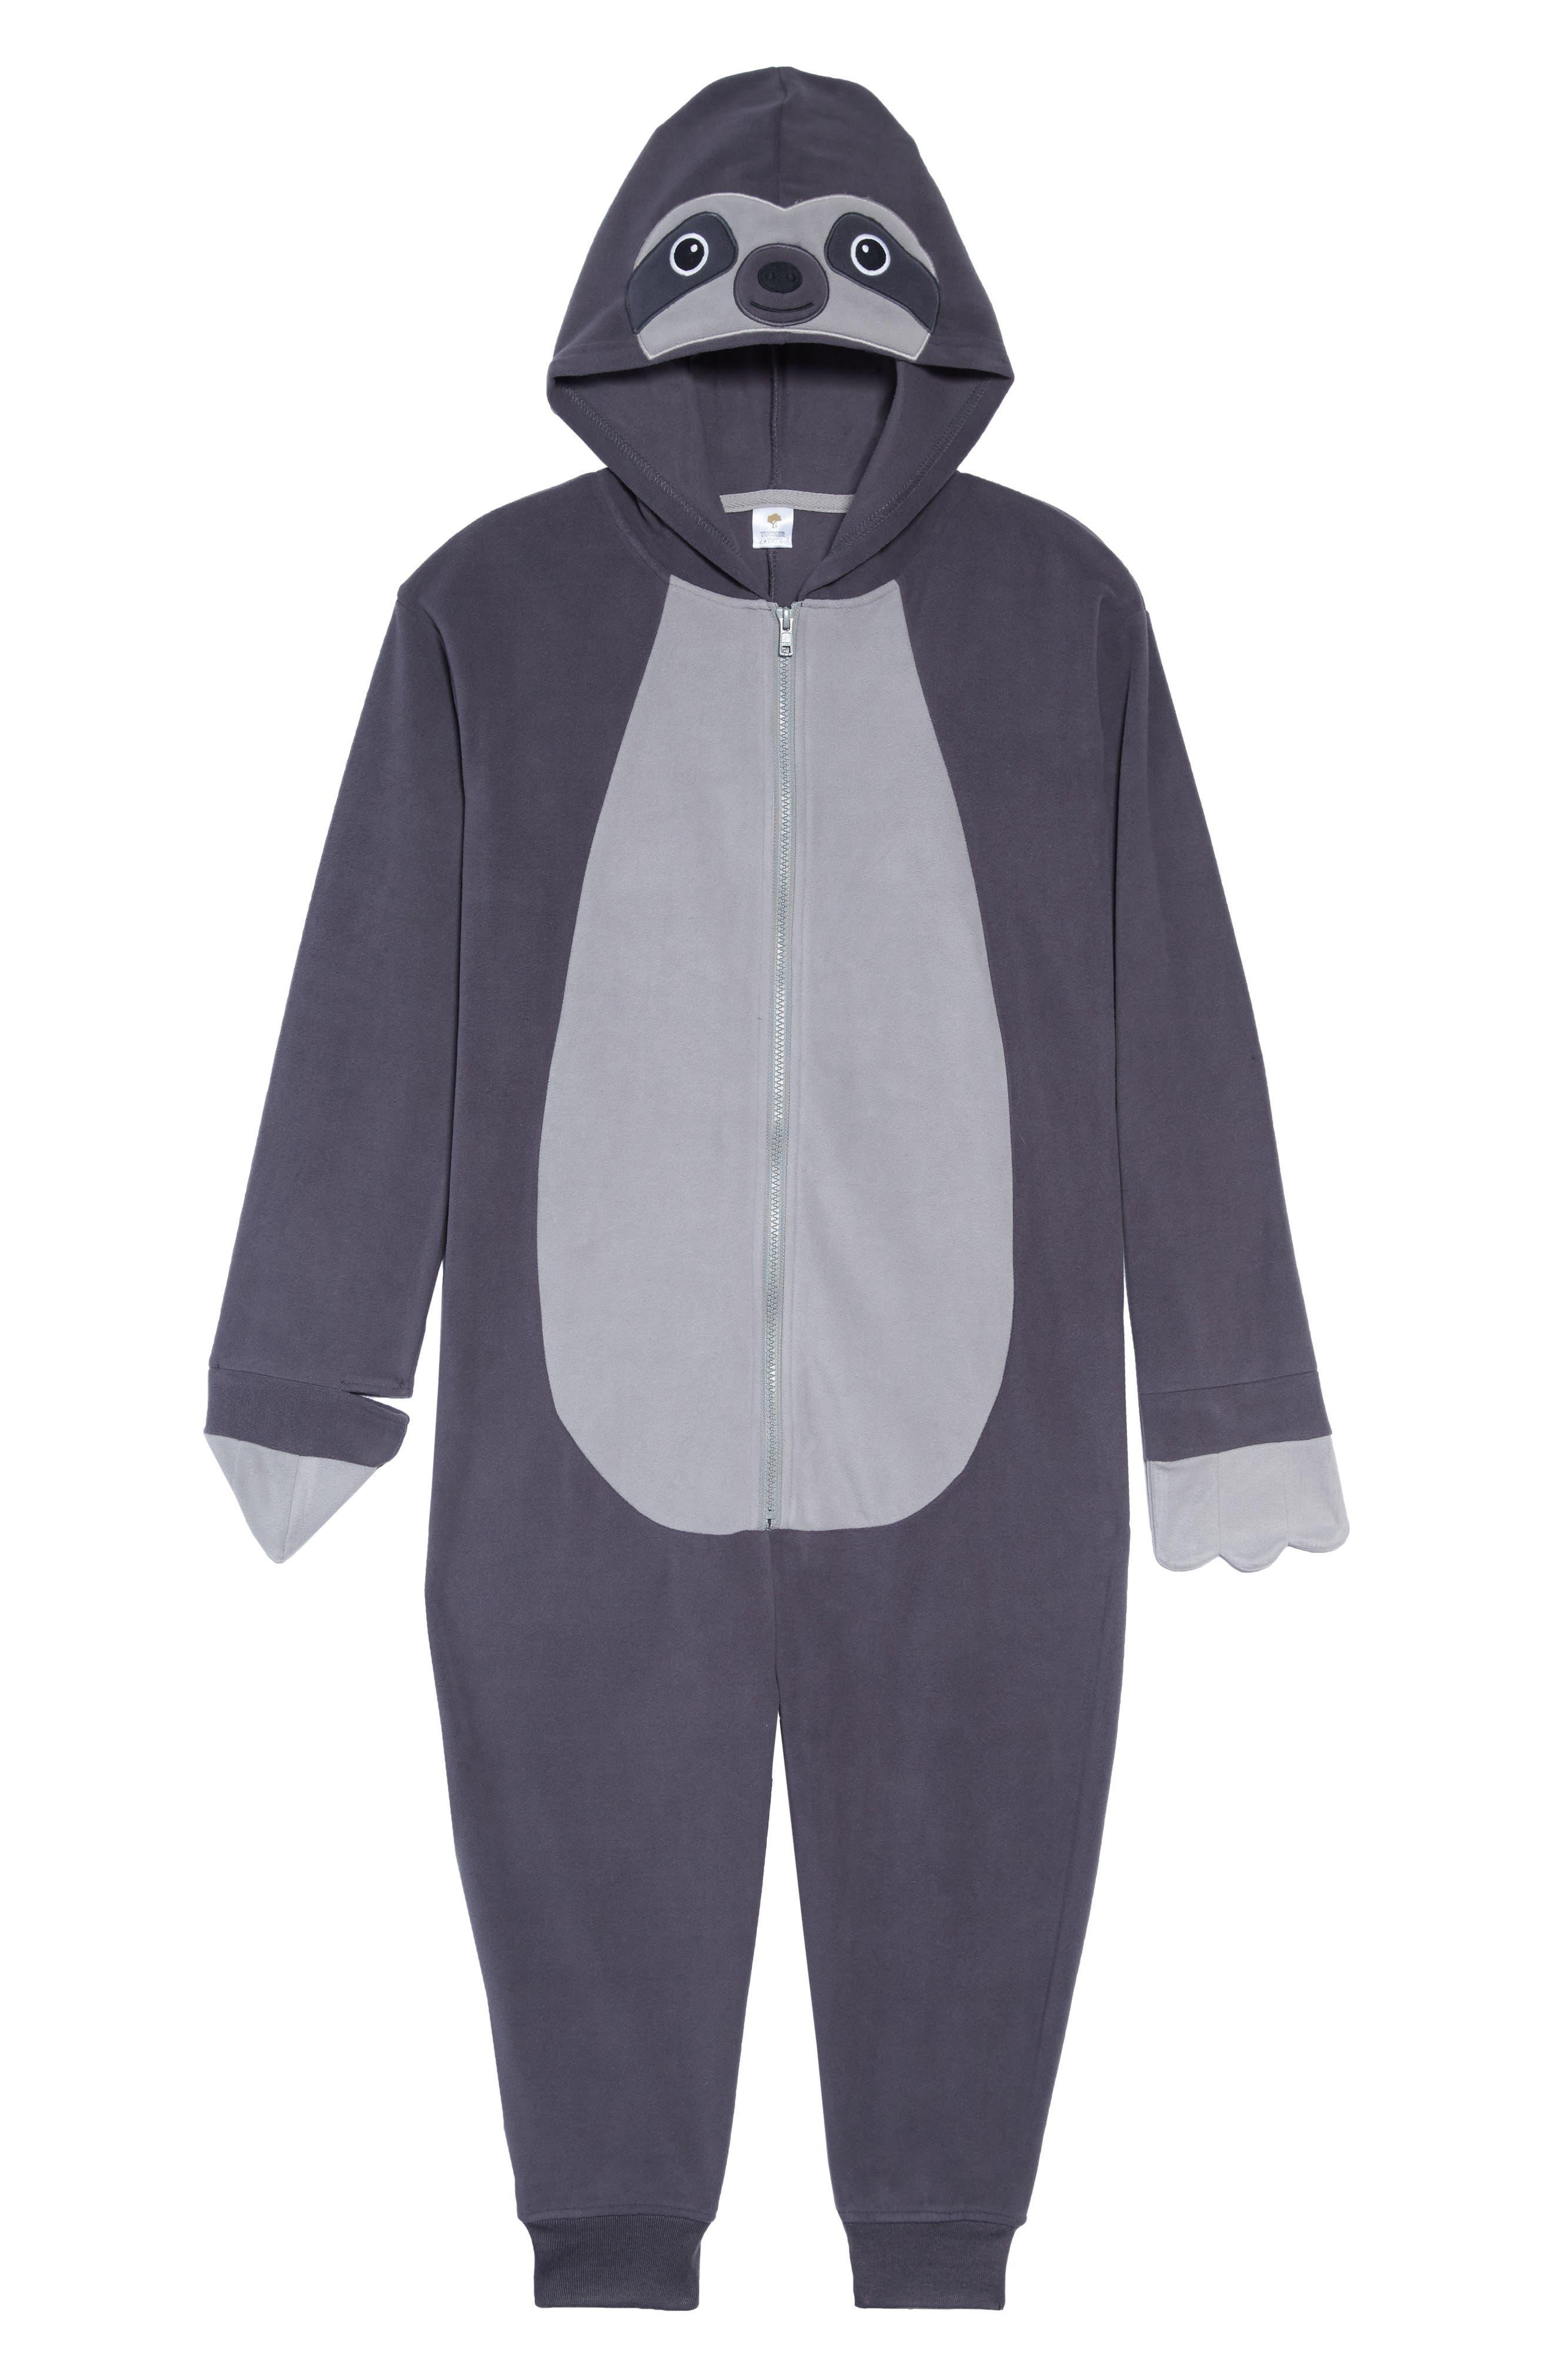 Sloth Hooded One-Piece Pajamas,                             Main thumbnail 1, color,                             GREY STONEHENGE SLOTH